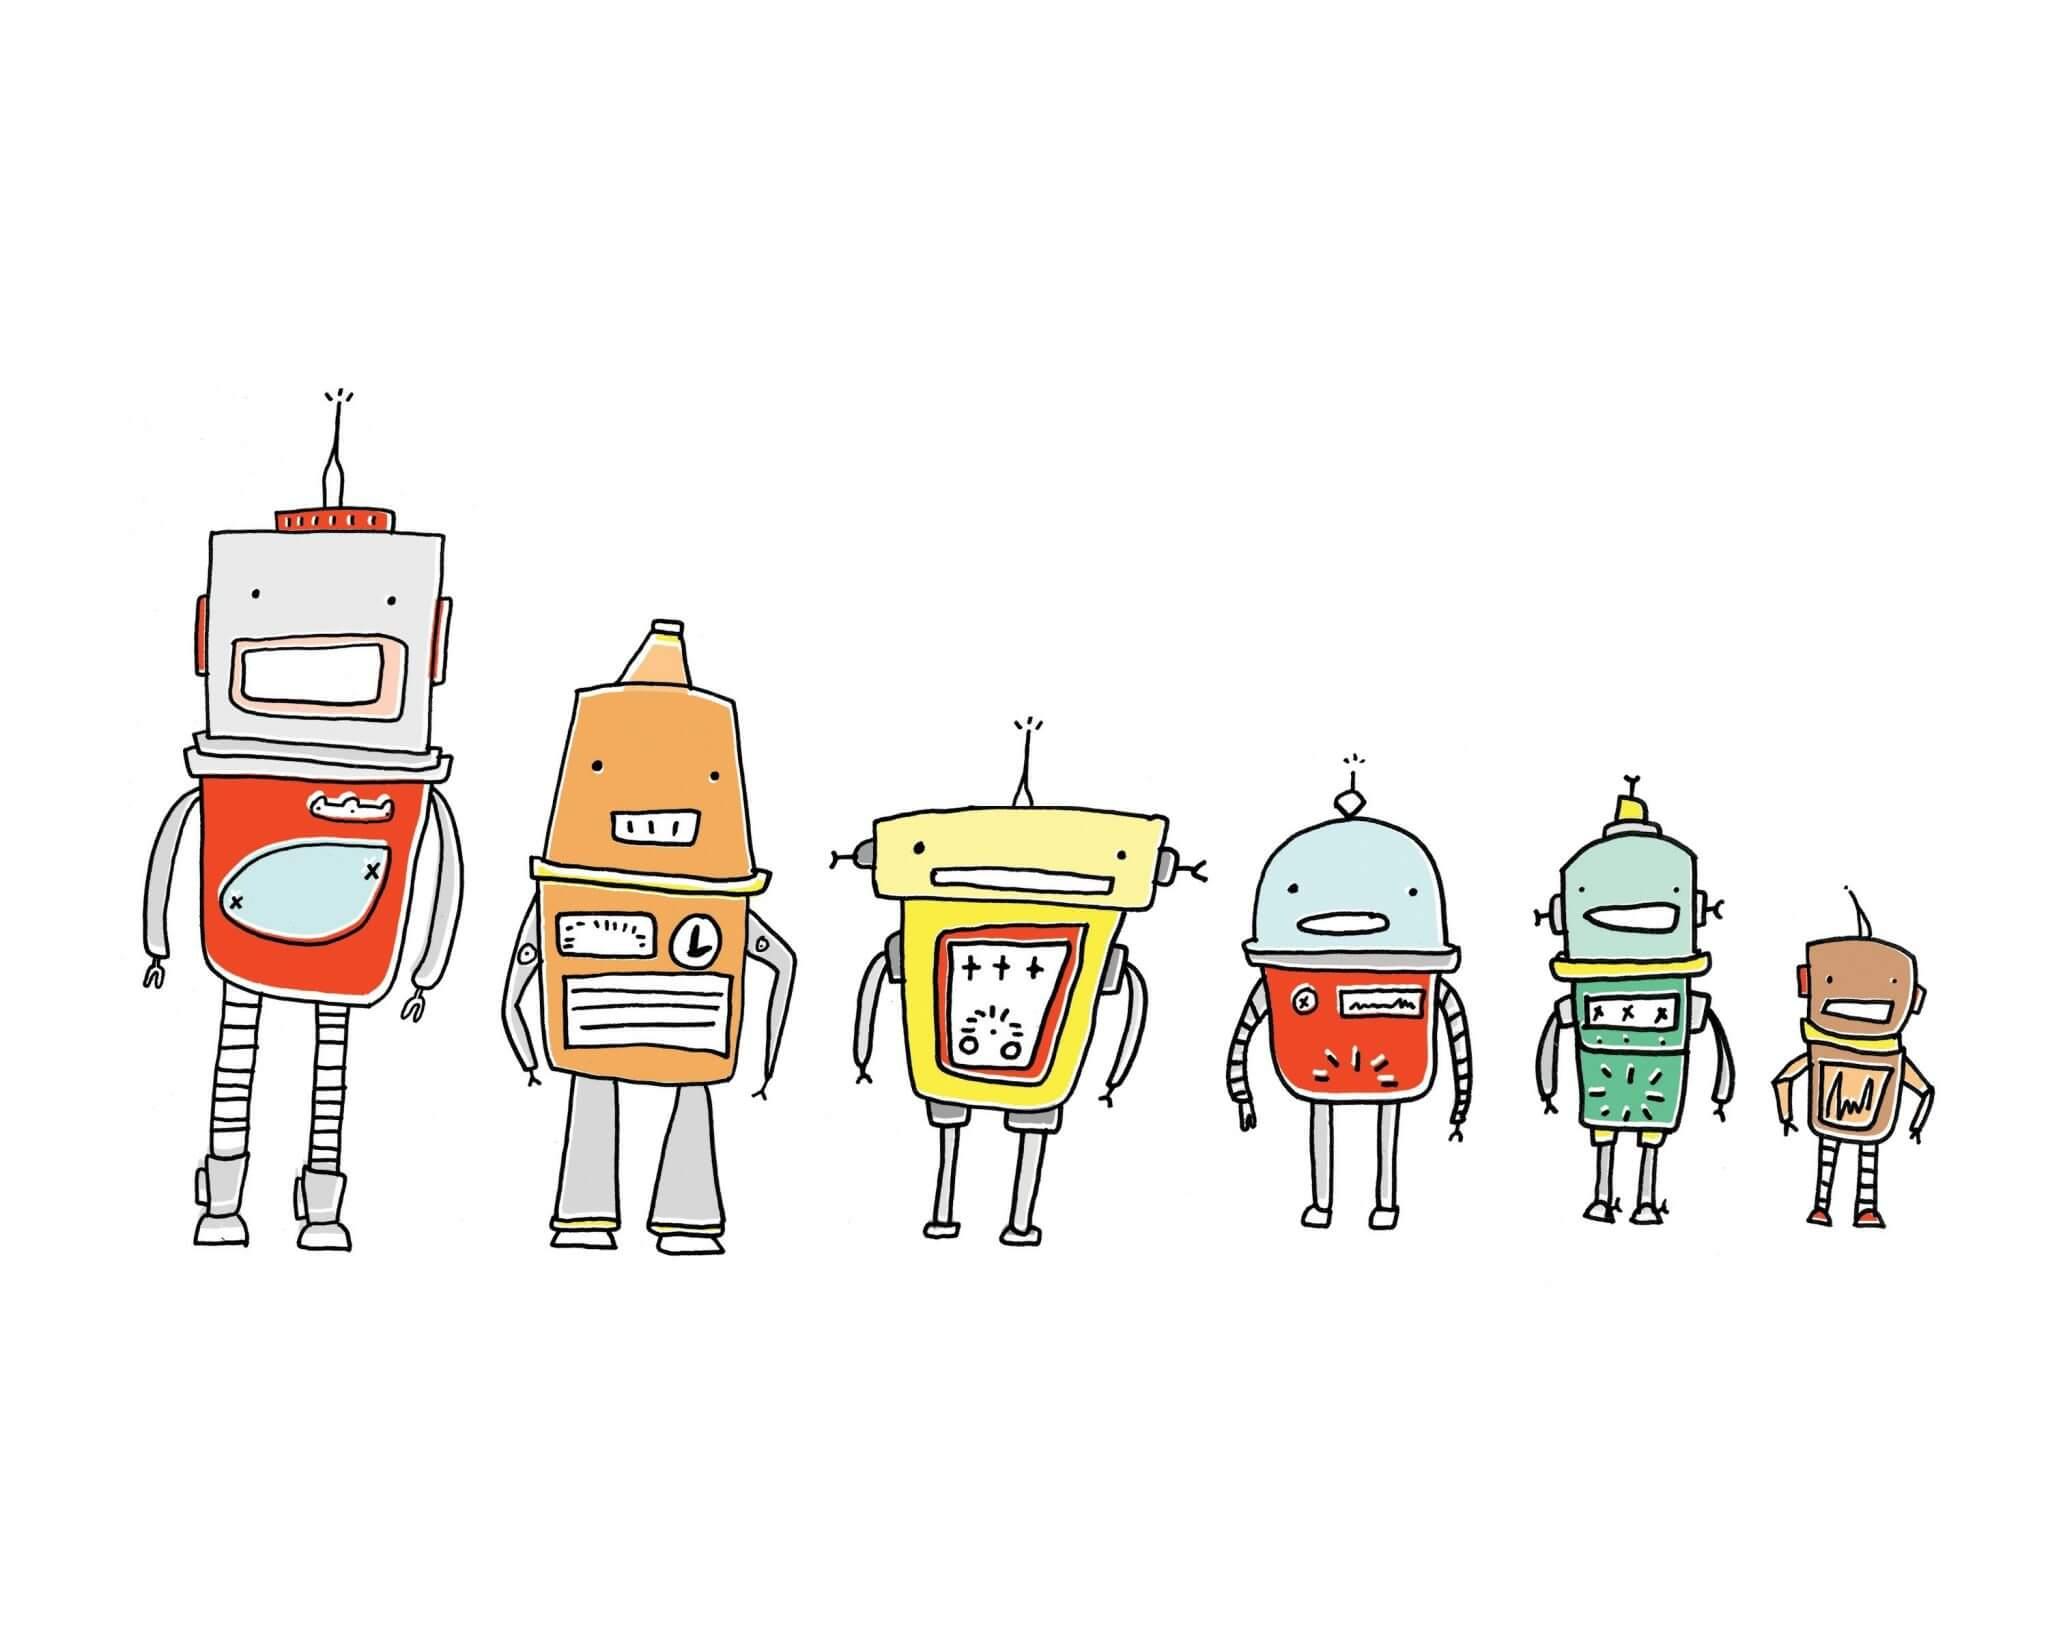 original 285585 wdqi9eifz2nzajnqymxogglmr - O que são bots?